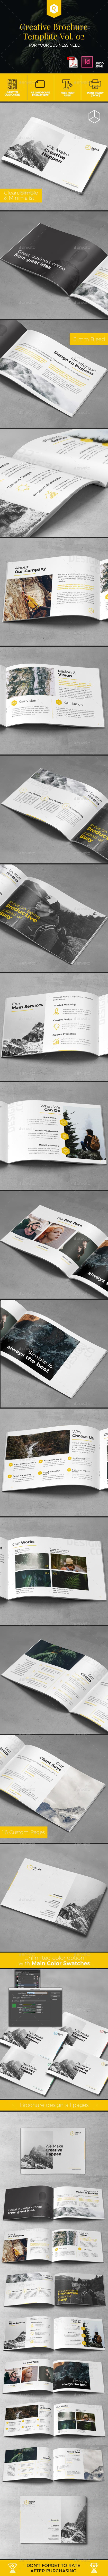 A5 Creative Brochure Template Vol. 02 - Corporate Brochures